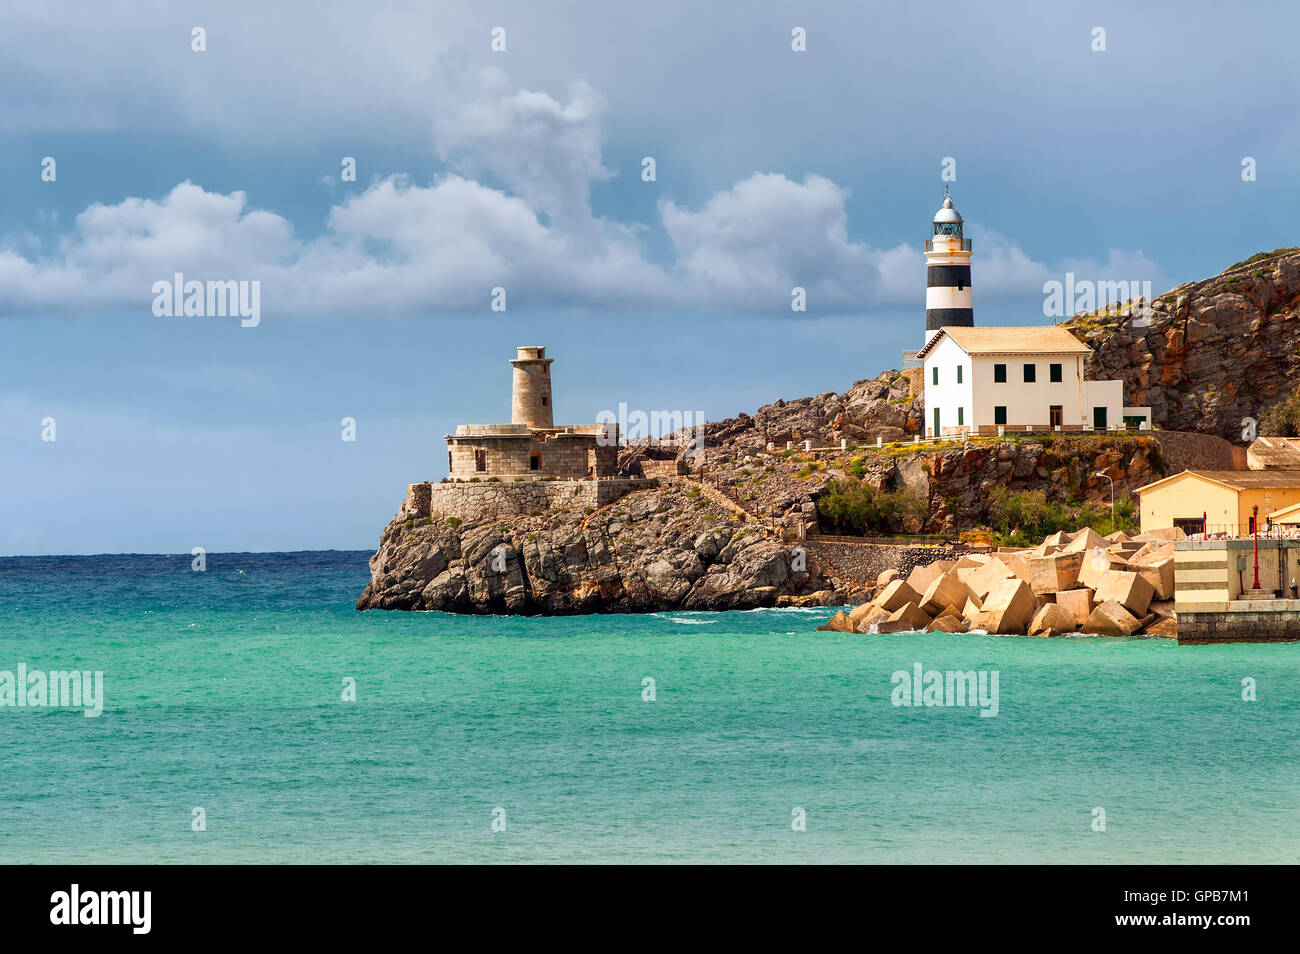 Lighthouse of Soler, Mediterranean Sea Coast, Mallorca, Spain Stock Photo